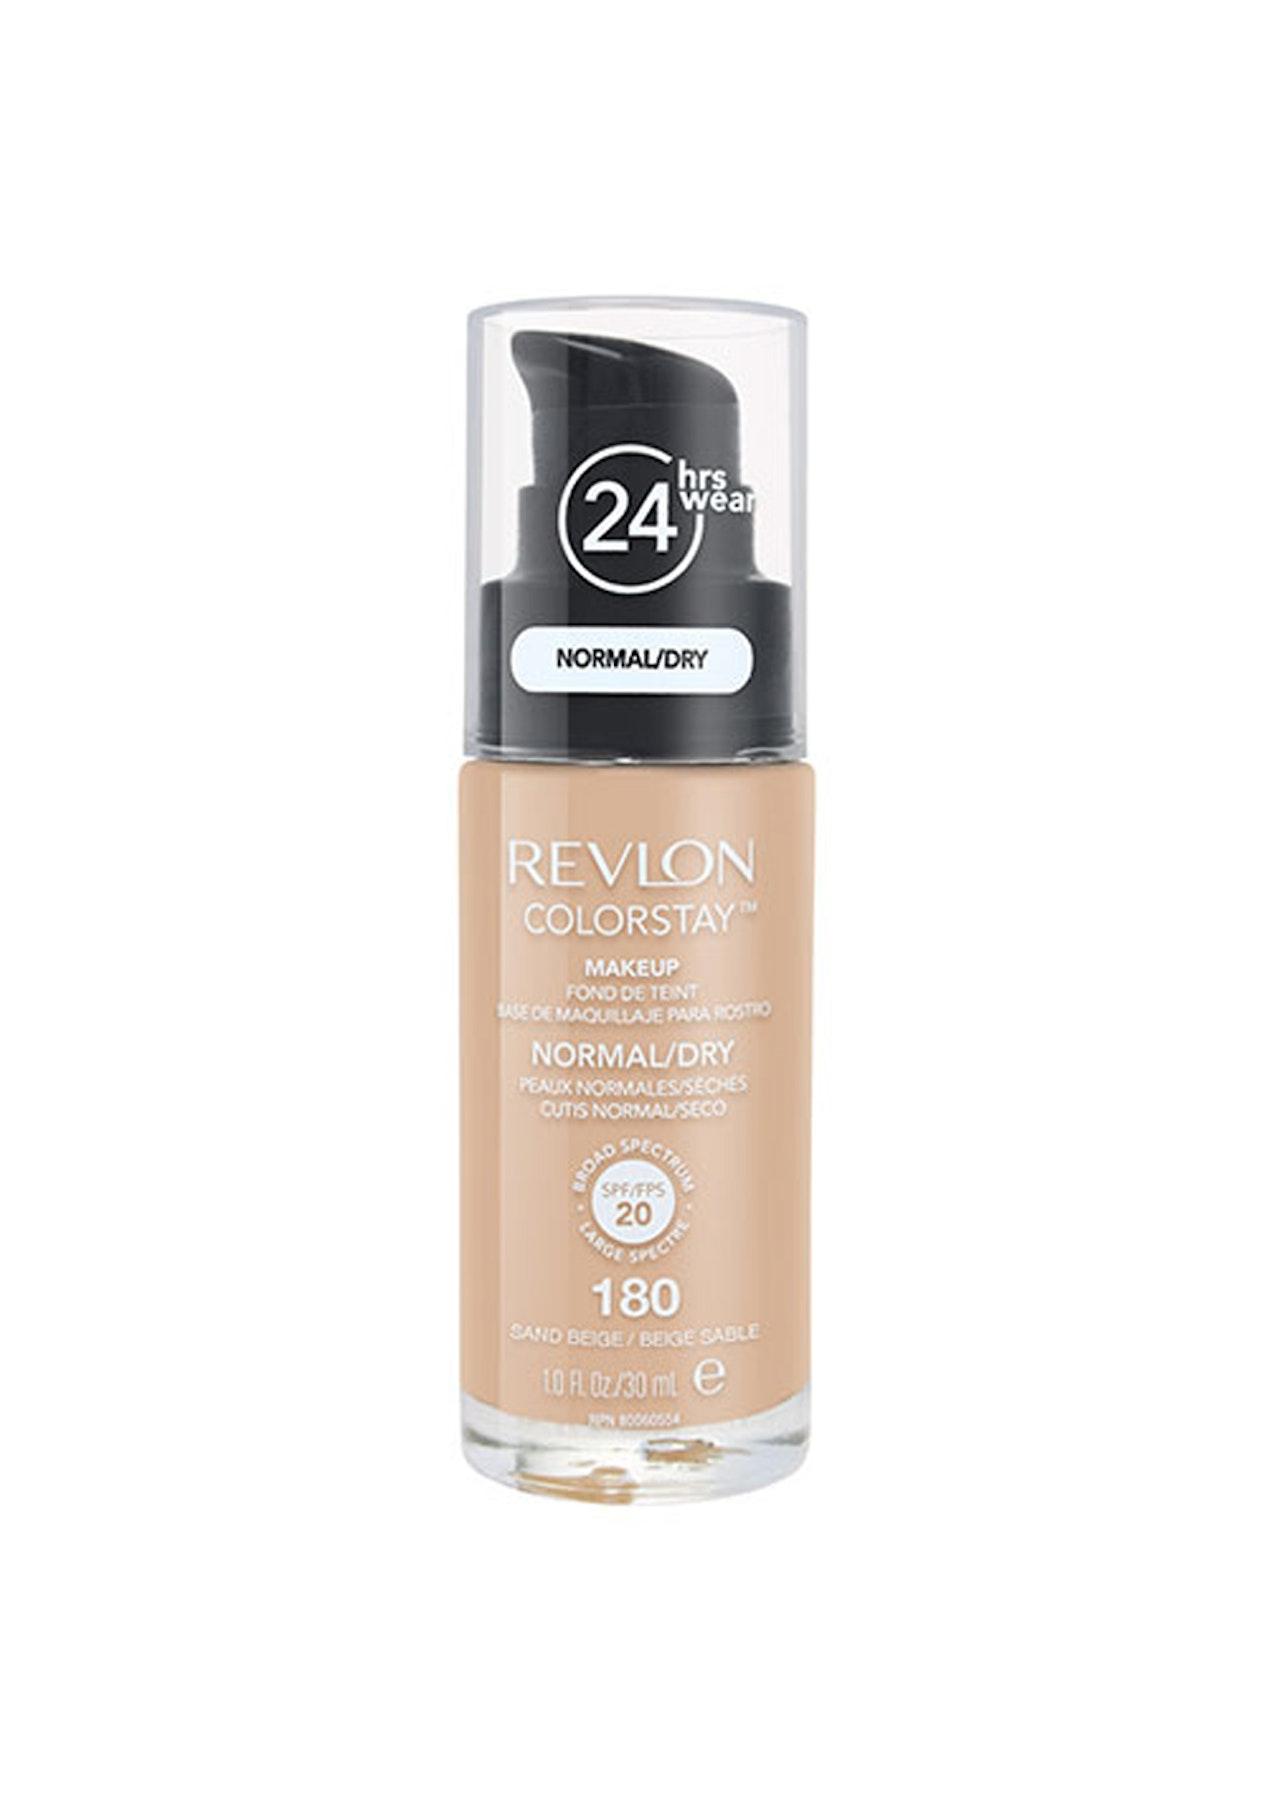 Revlon Colorstay Makeup Normal Dry Skin - 180 Sand Beige 30ml